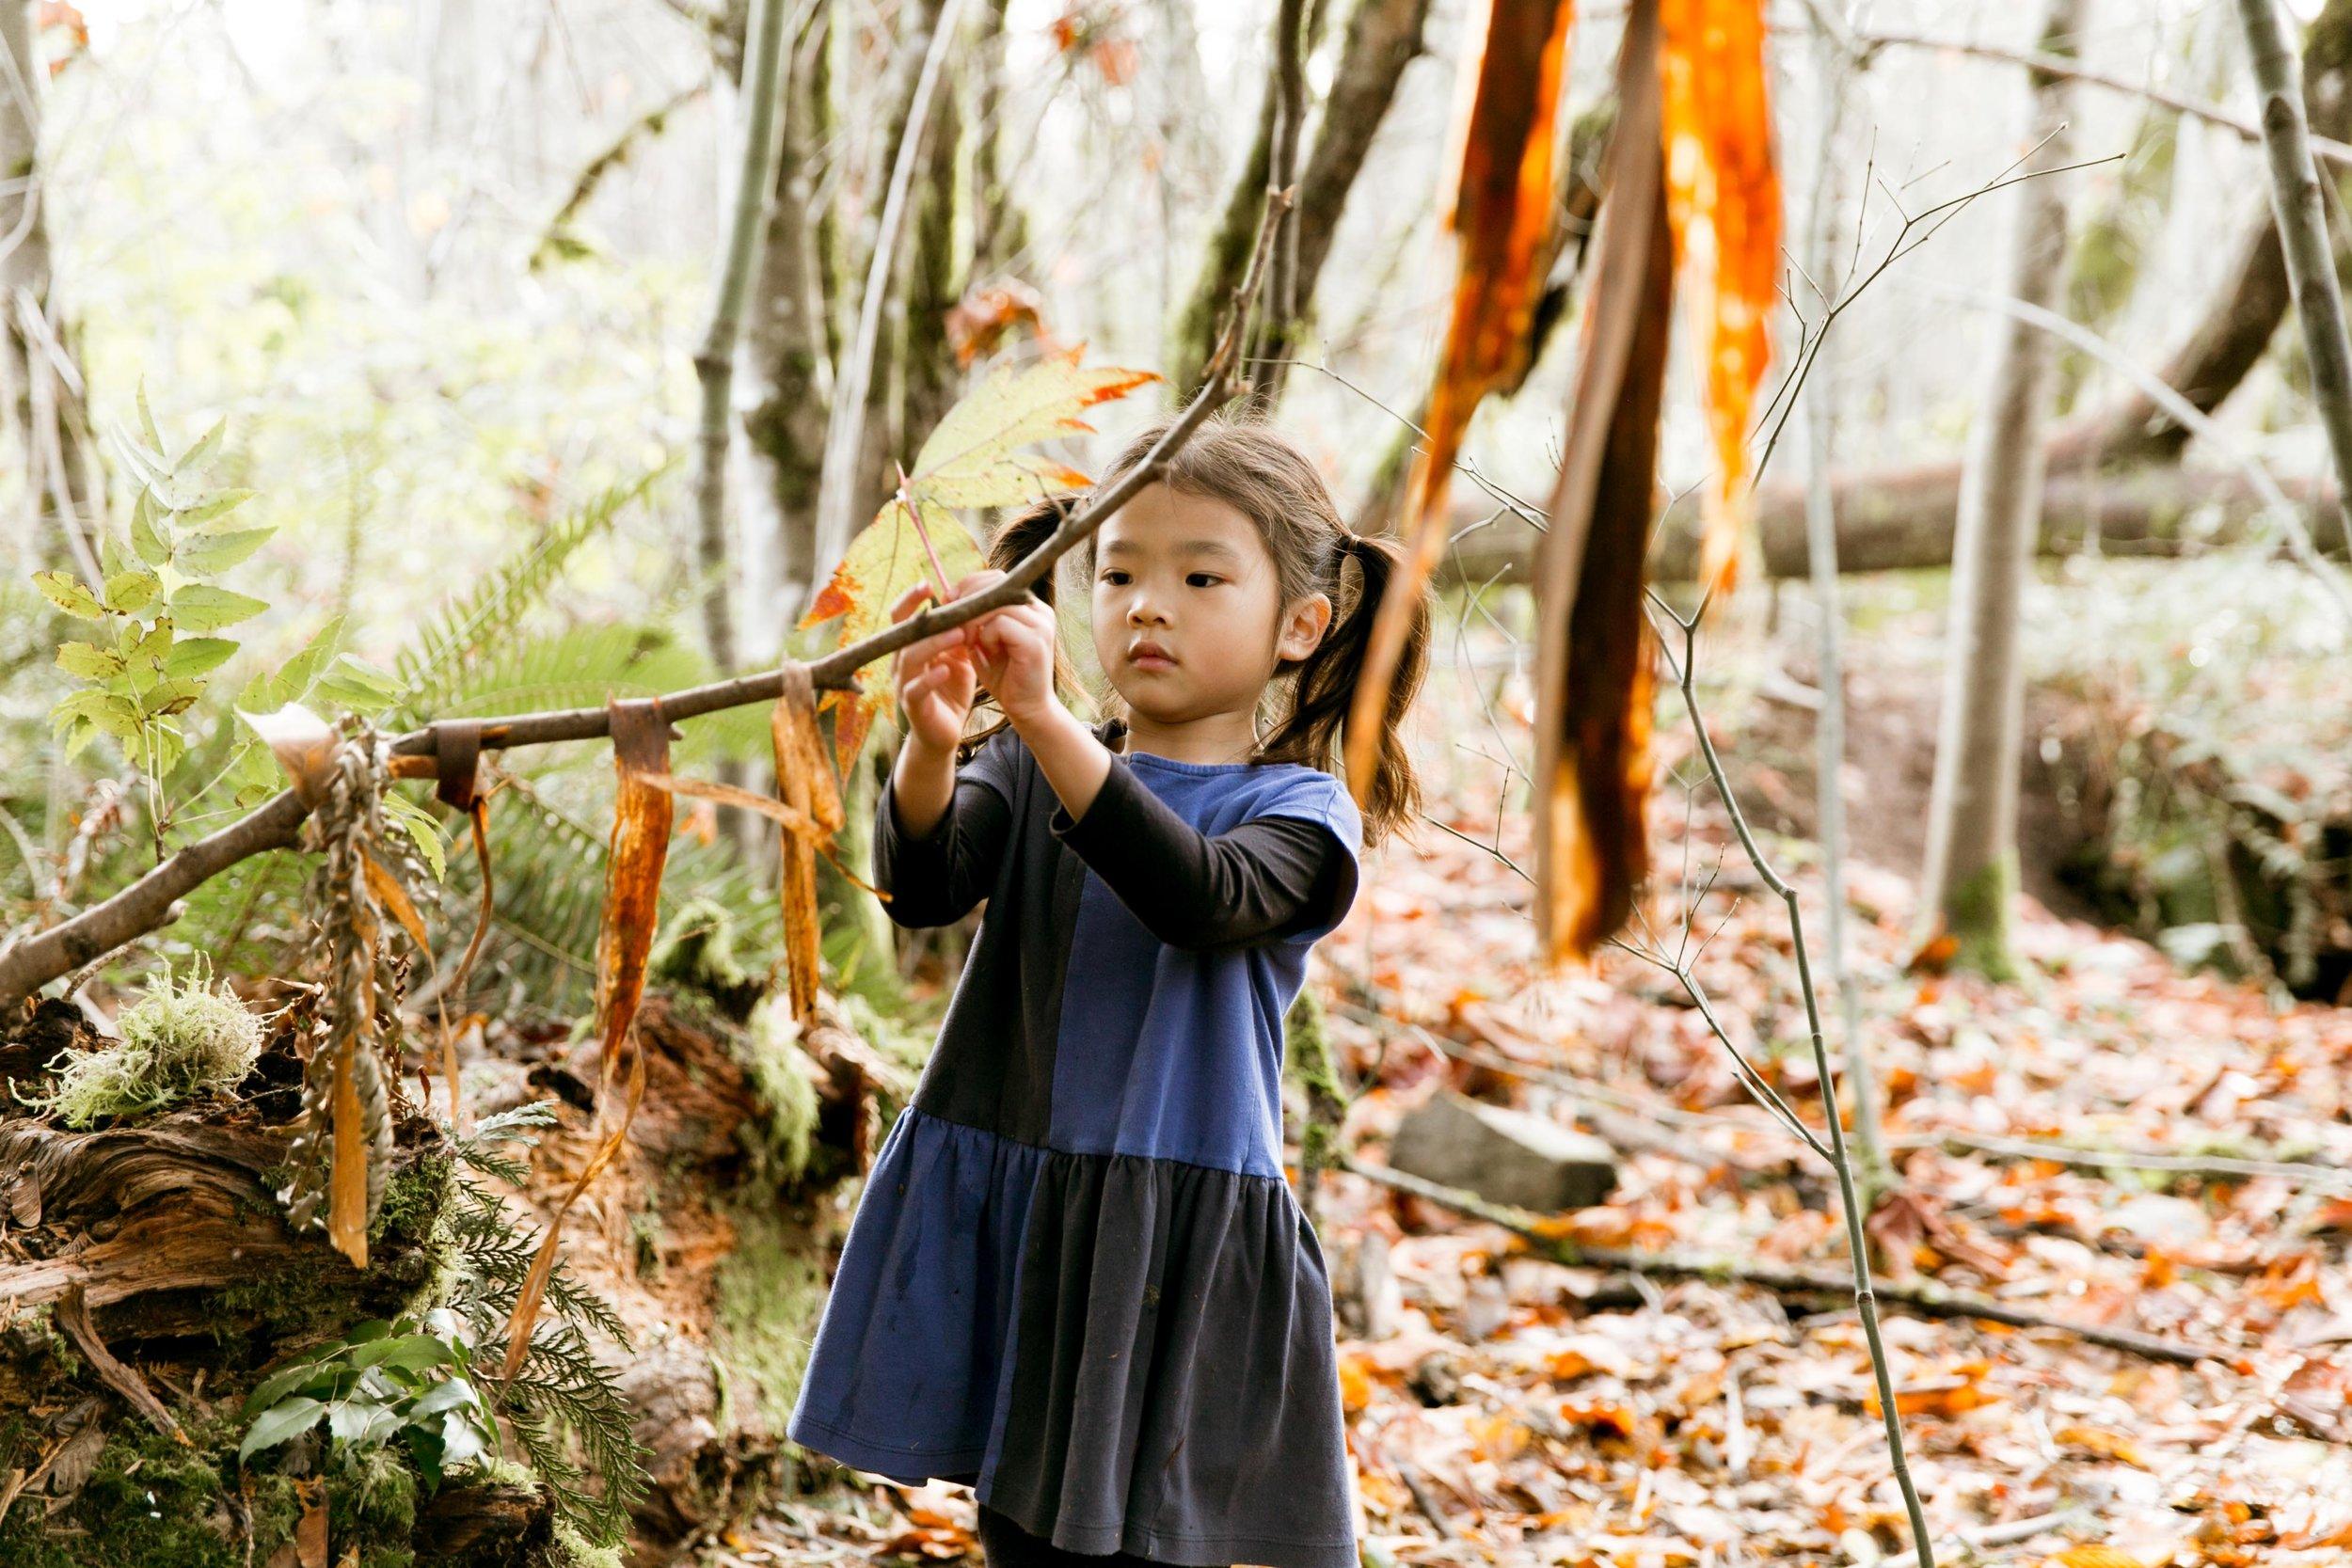 Sienna-Renee-Photography-Nature-Nuts-1294-2.jpg